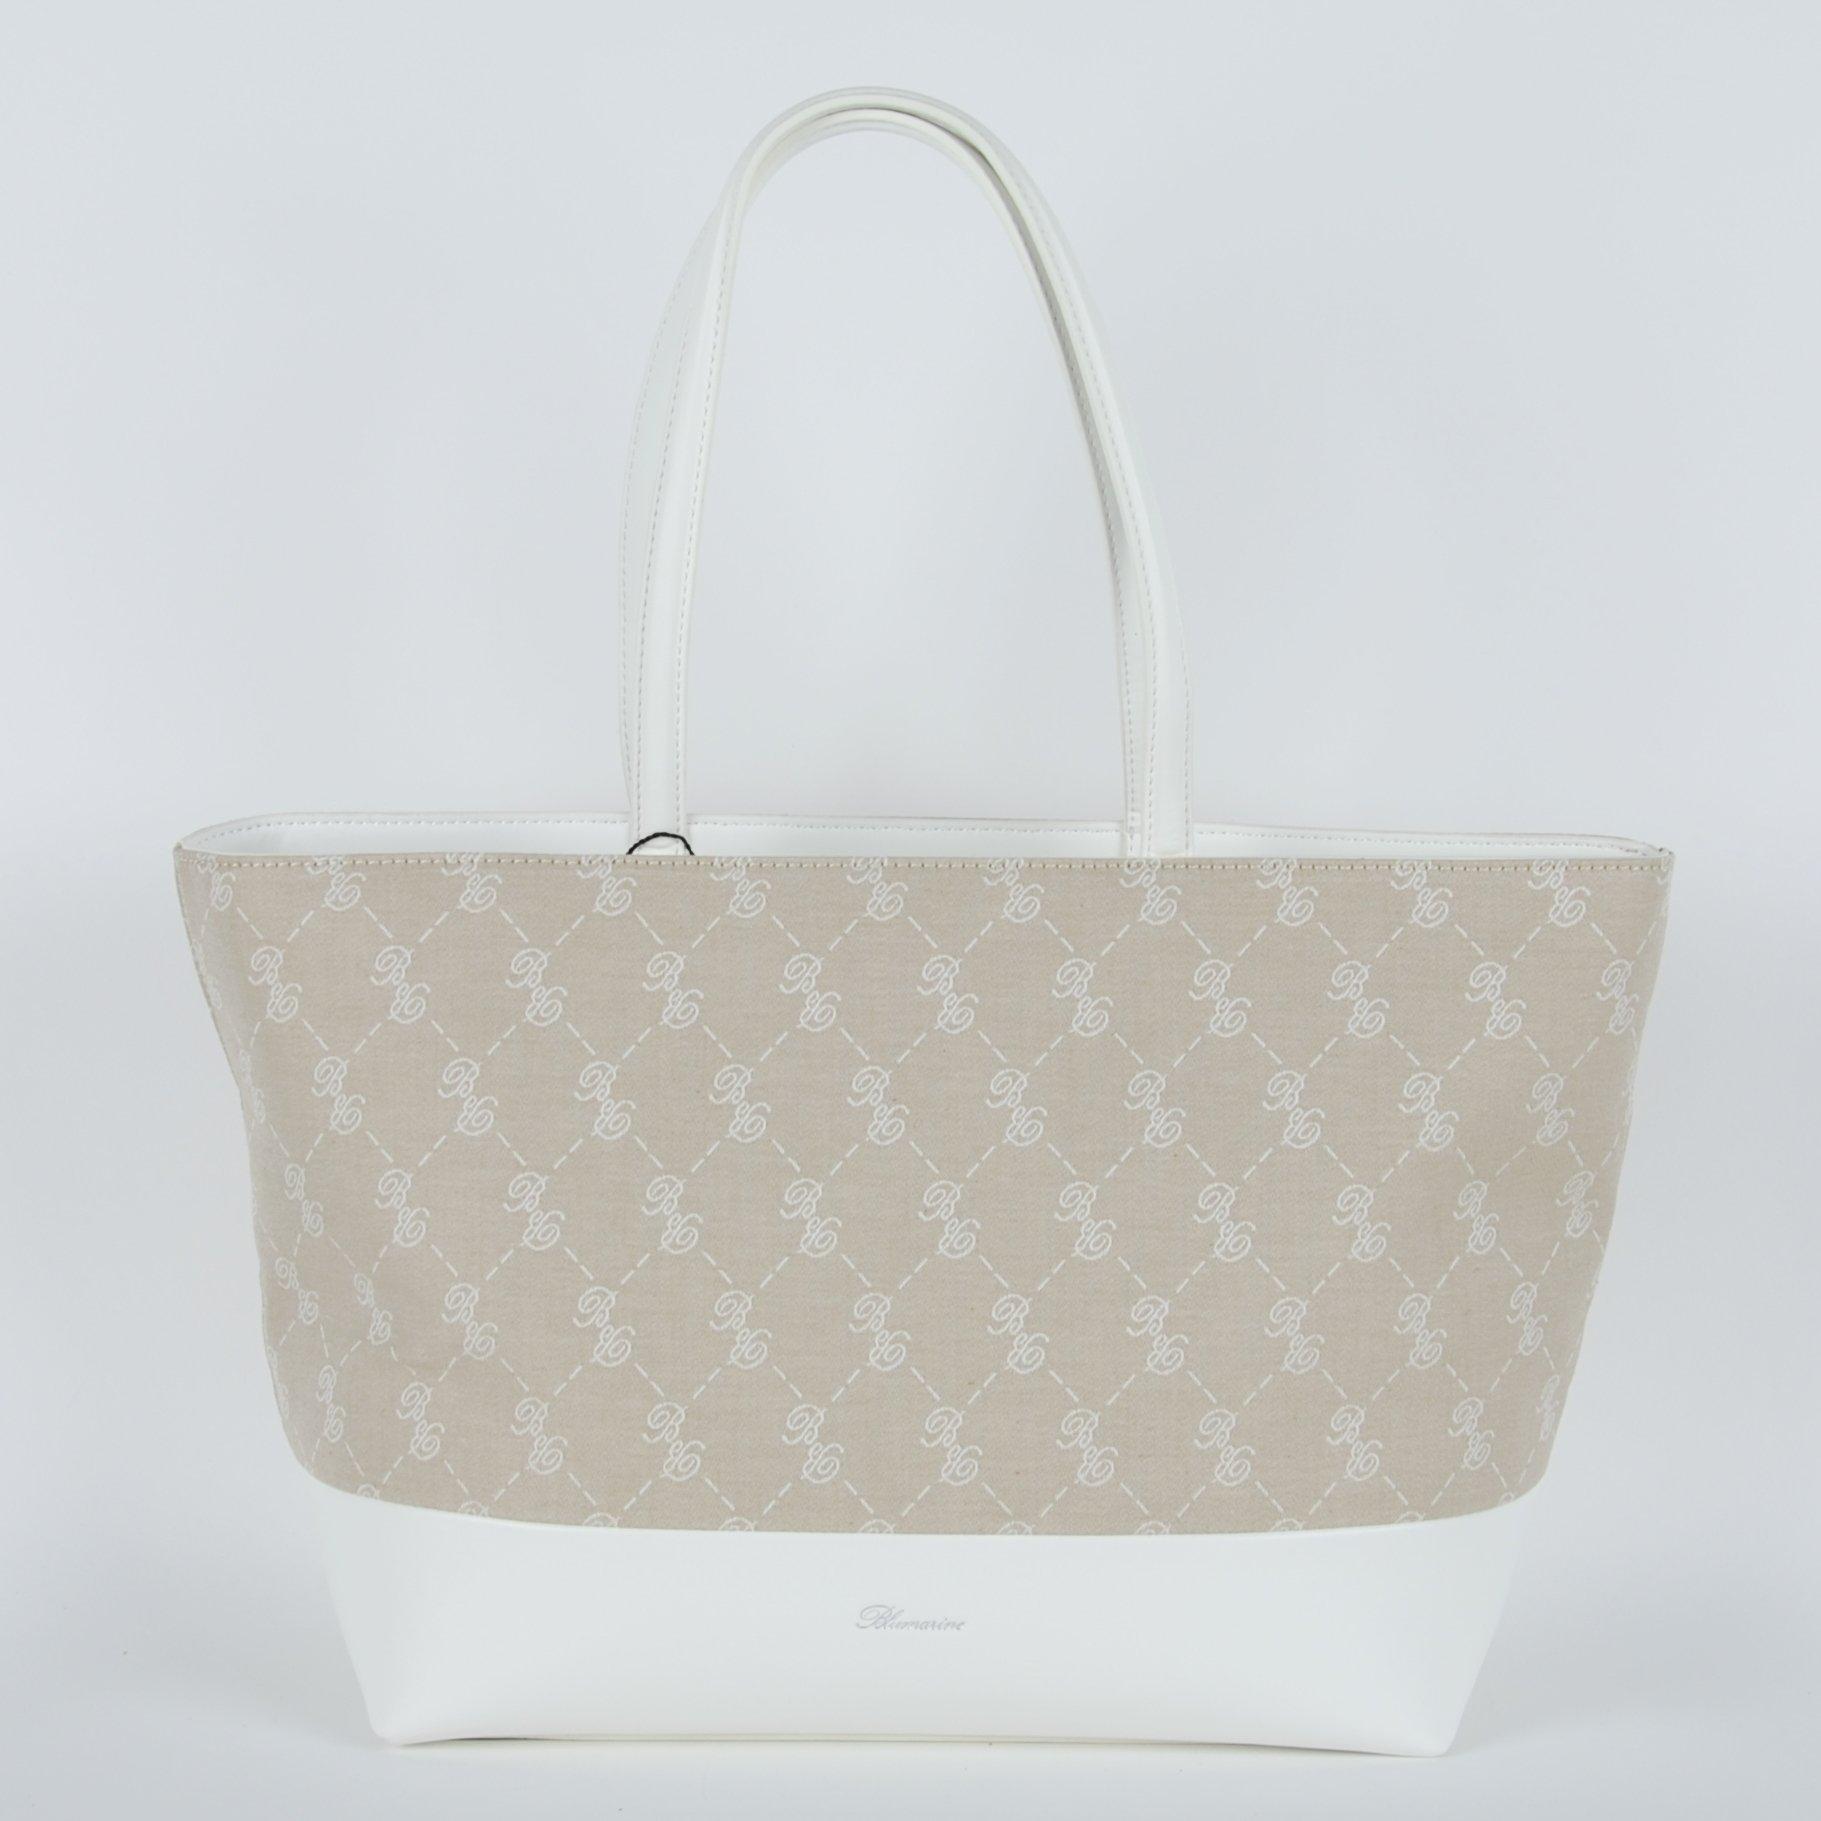 Blumarine Women's Shopping Bag White BL1421492